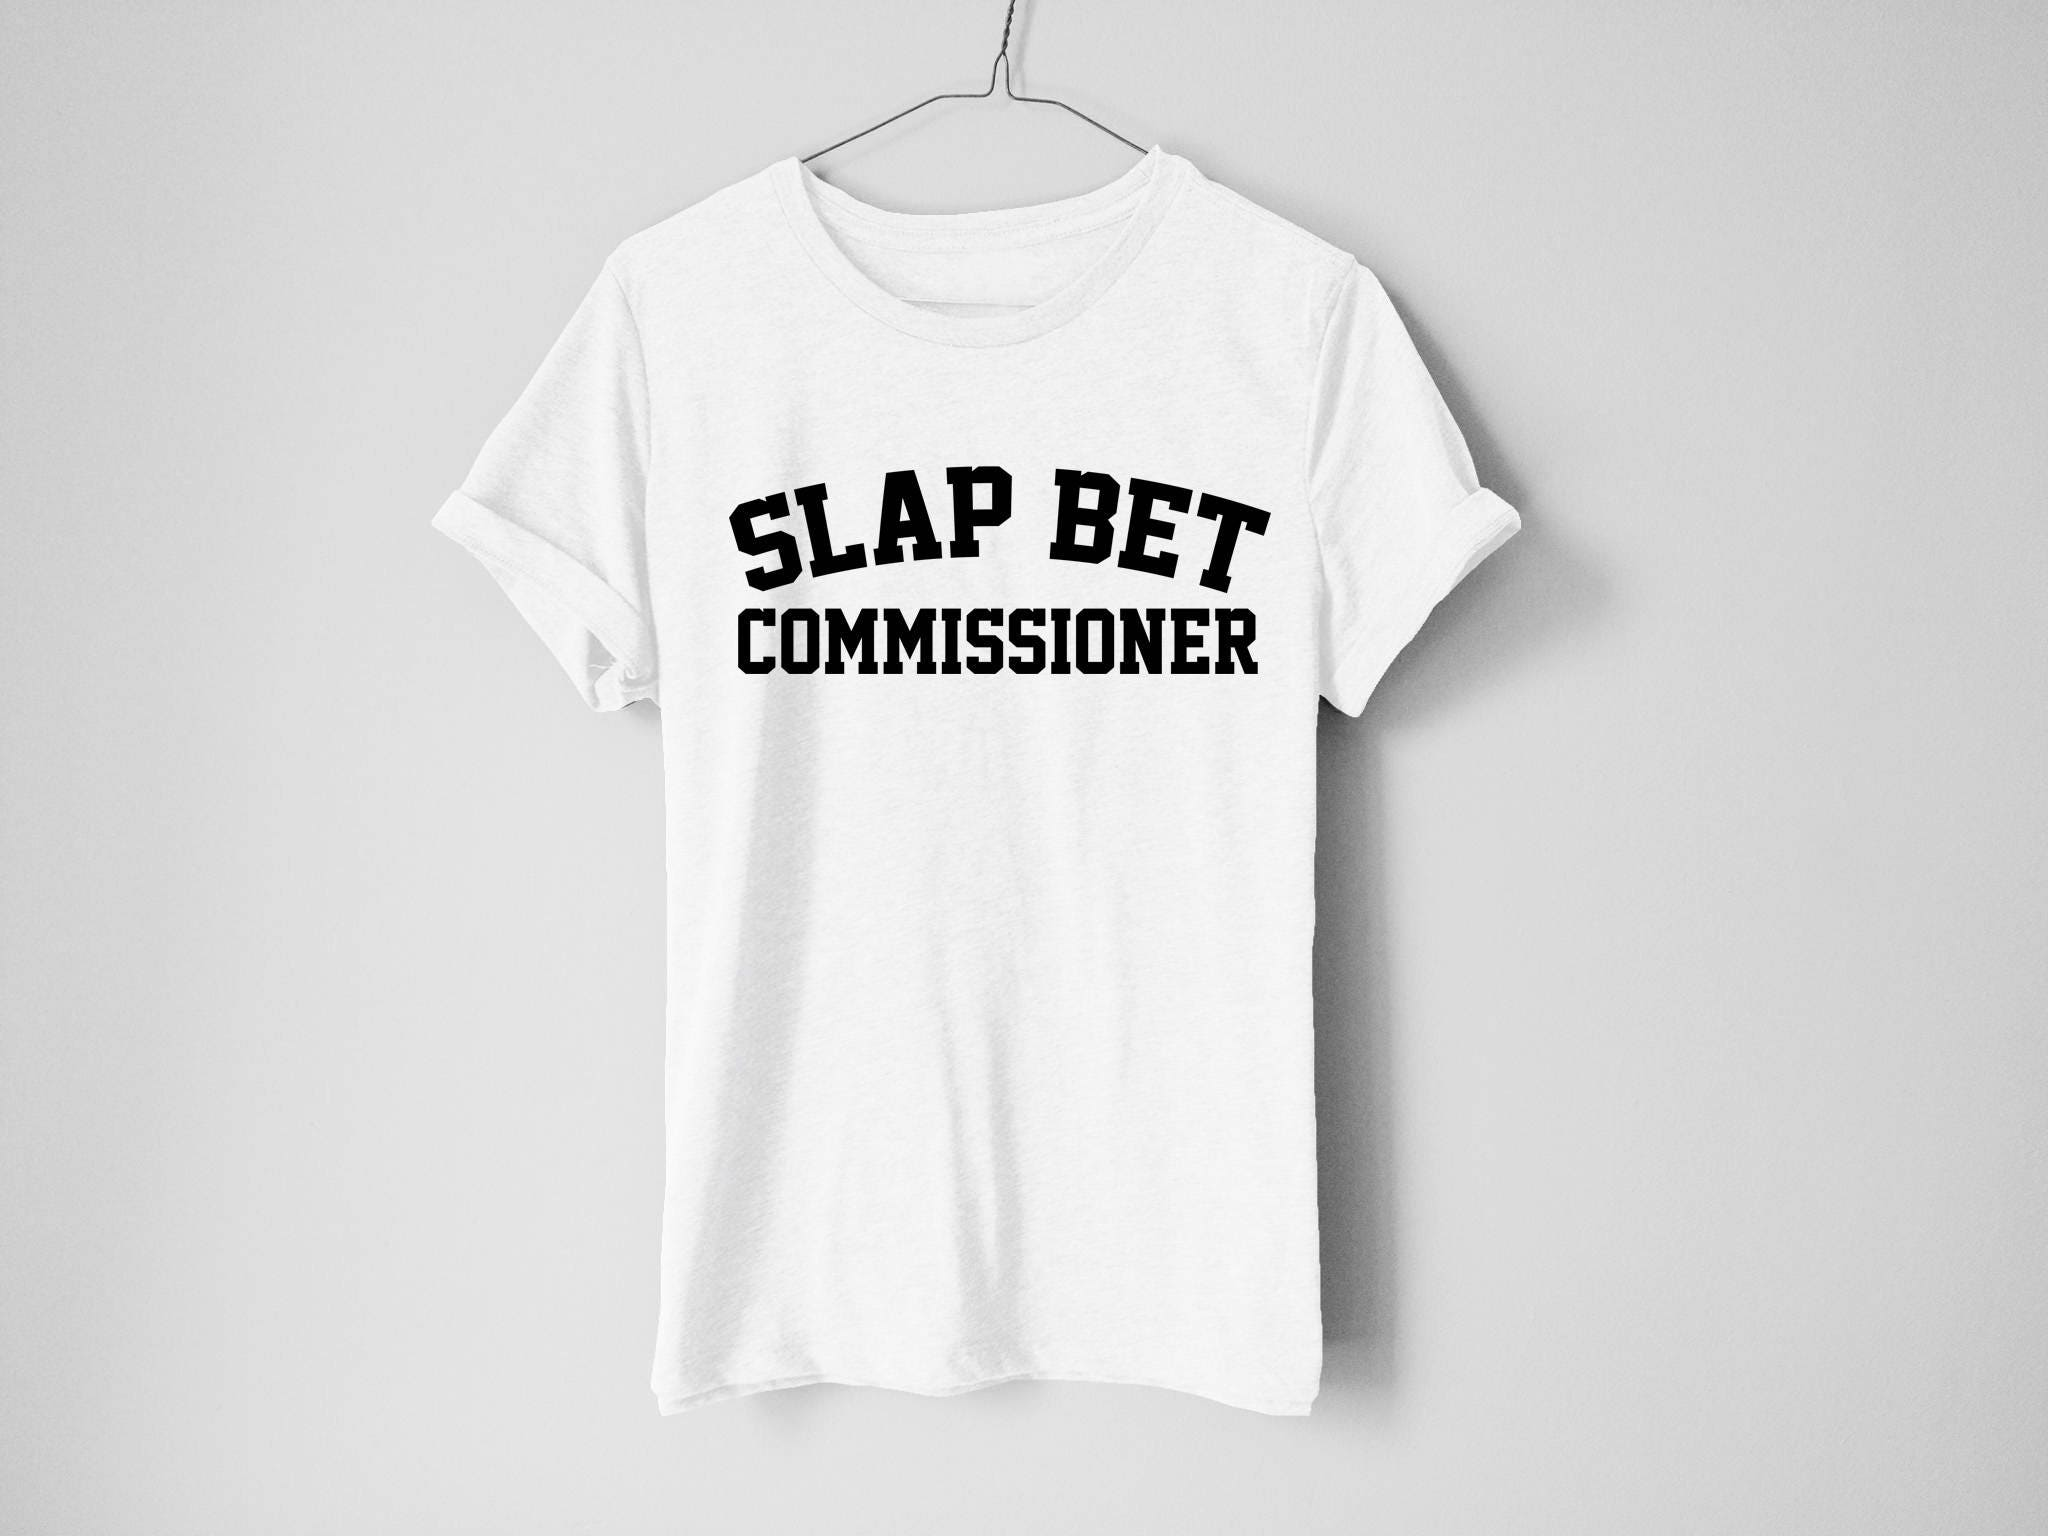 Slap Bet Commissioner Sweatshirt - Barney Shirt - How I Met Your Mother Shirt - How I Met Your Mother - Ted Shirt - Barney Stinson Shirt cQmFewQjdY